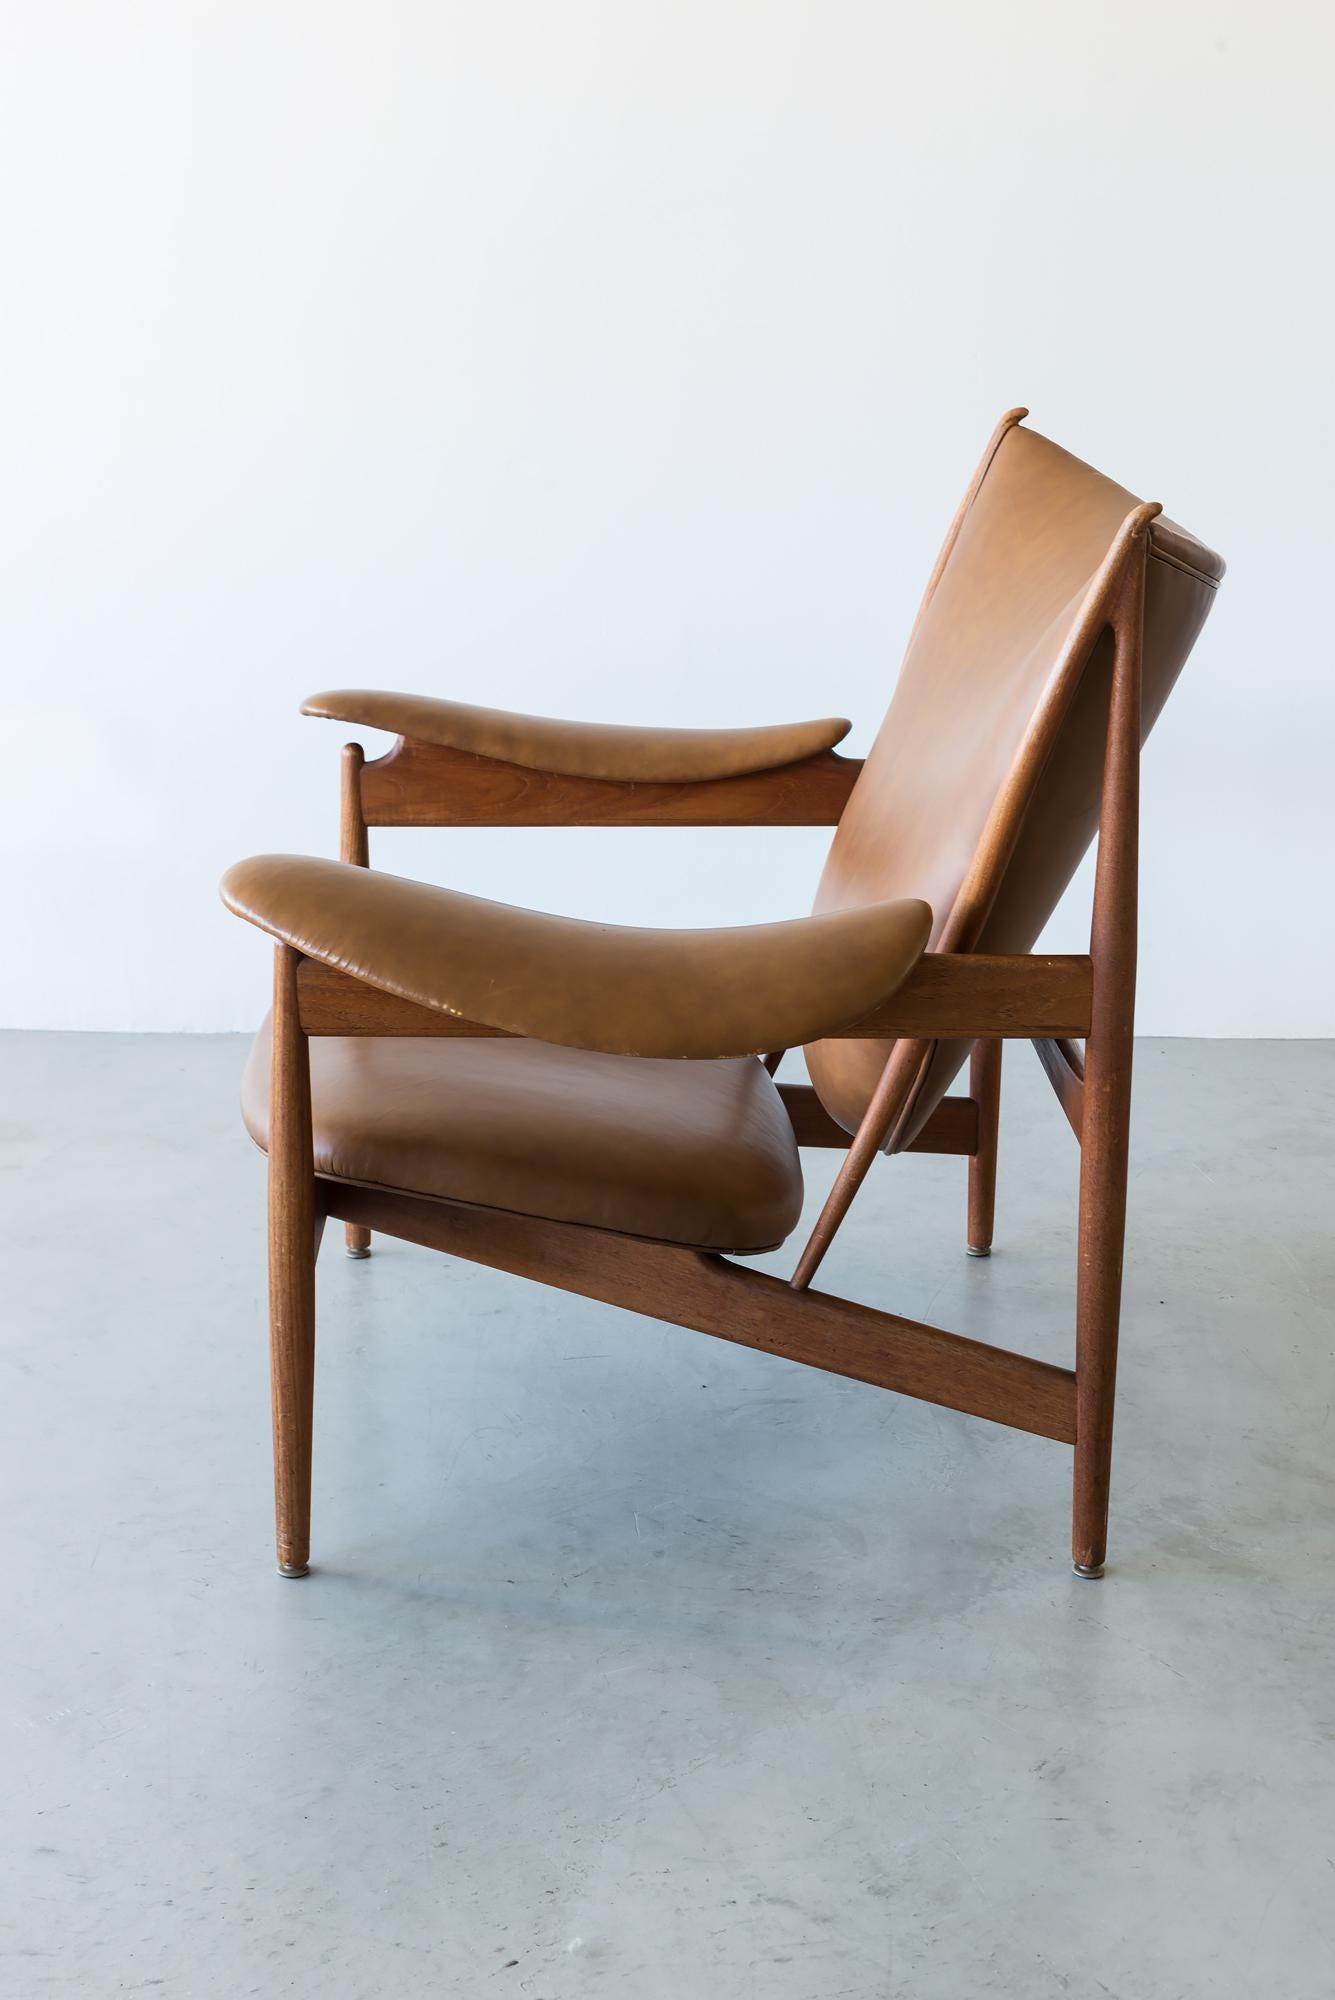 Superb Finn Juhl Chieftain Chair By Neils Vodder In Teak And Cognac/Brown Leather,  Denmark